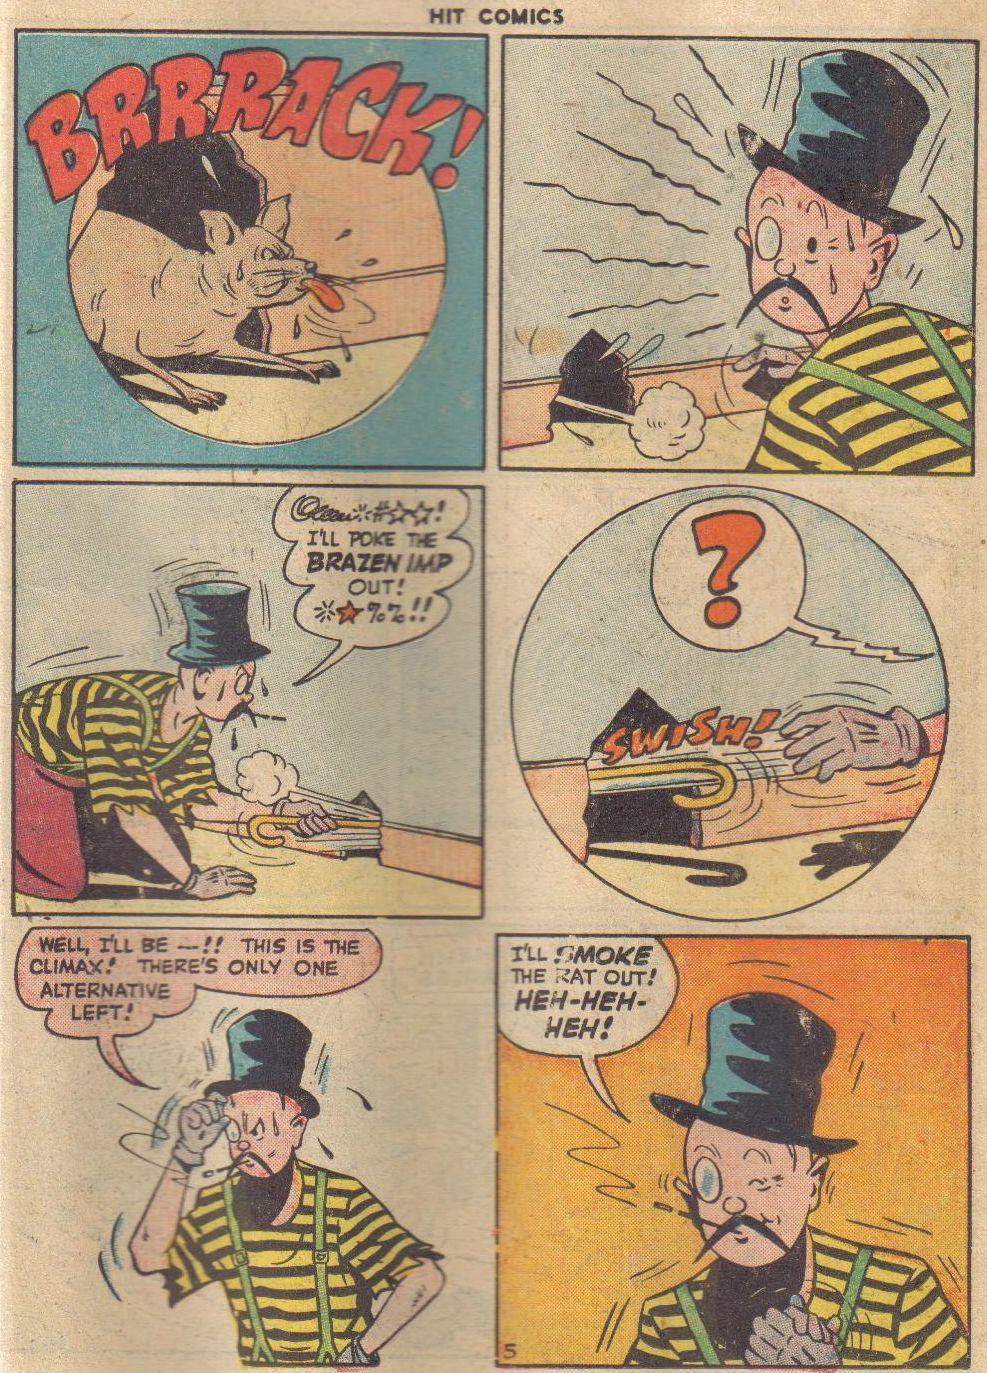 Read online Hit Comics comic -  Issue #45 - 56